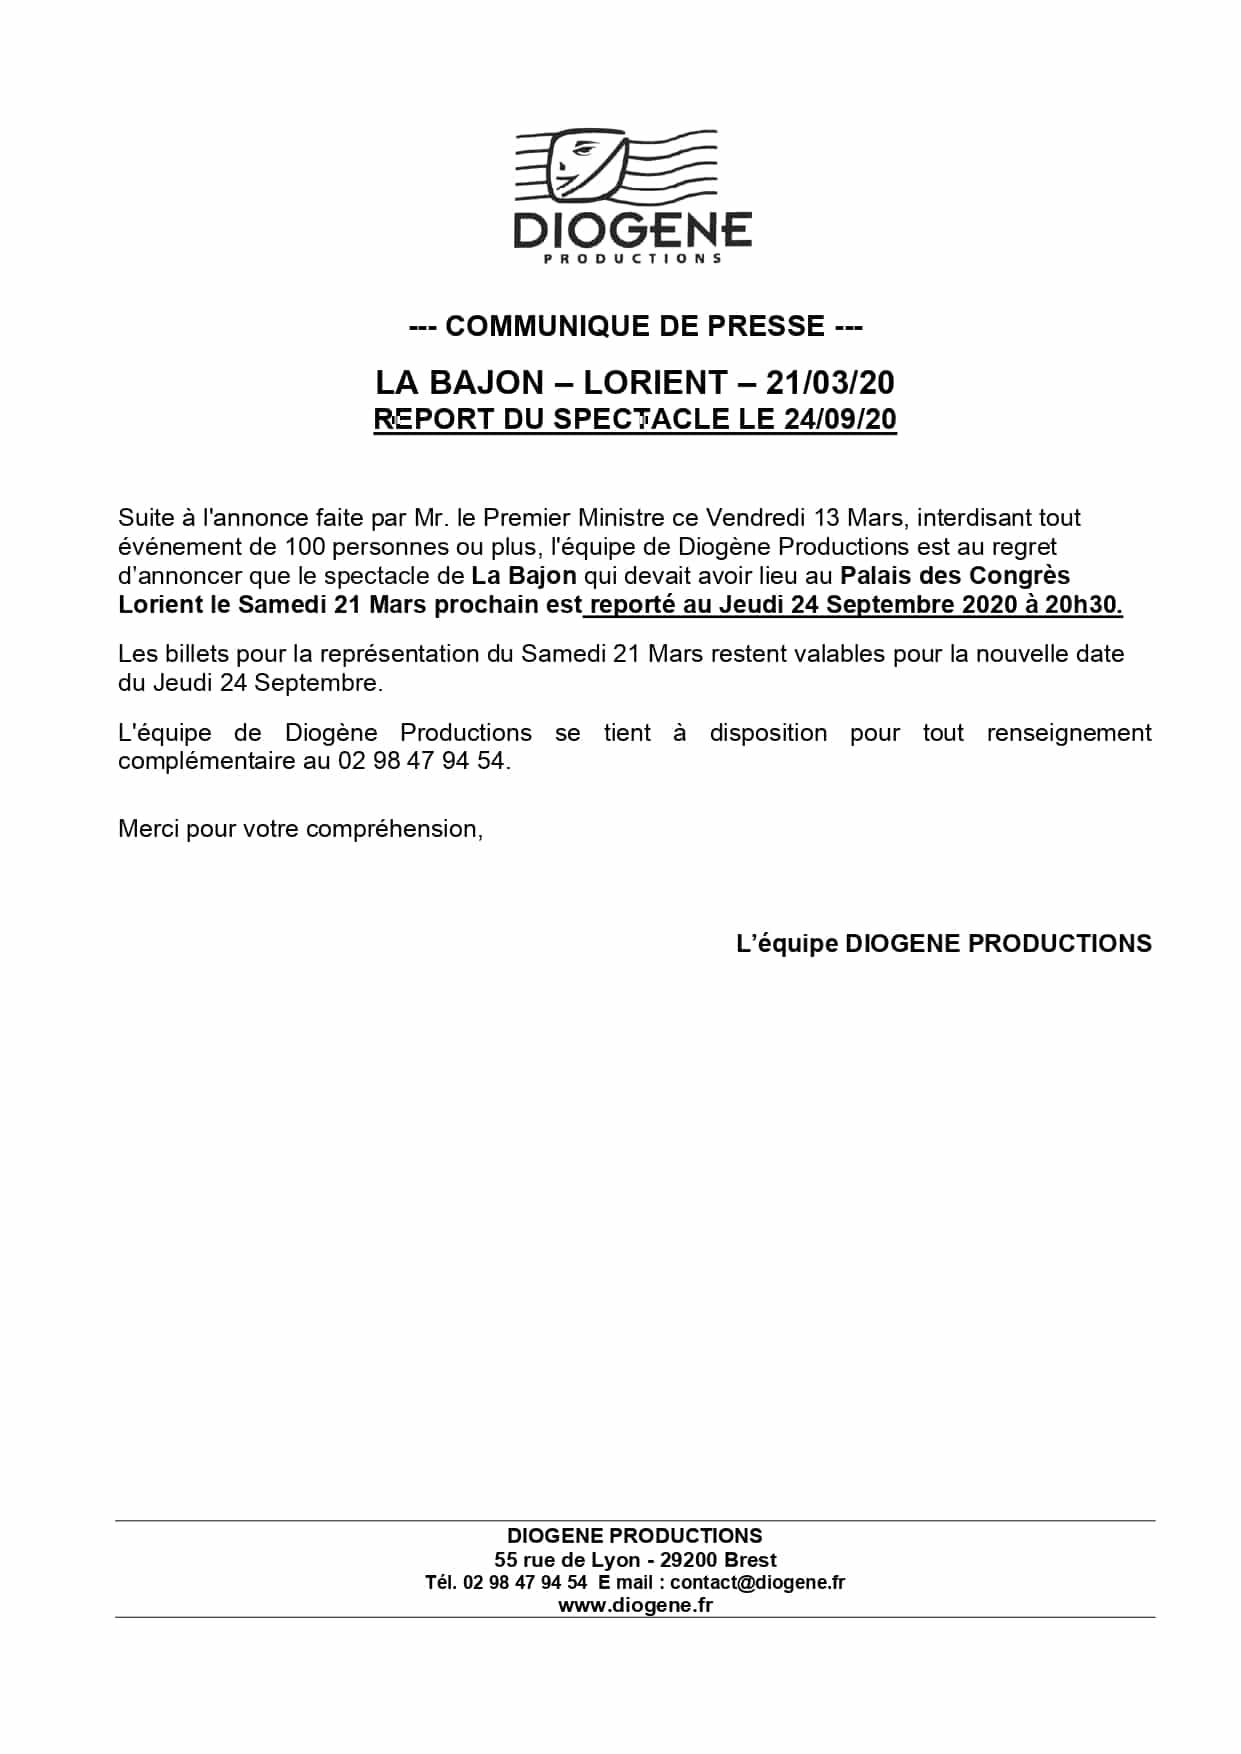 communiqué de presse report La Bajon